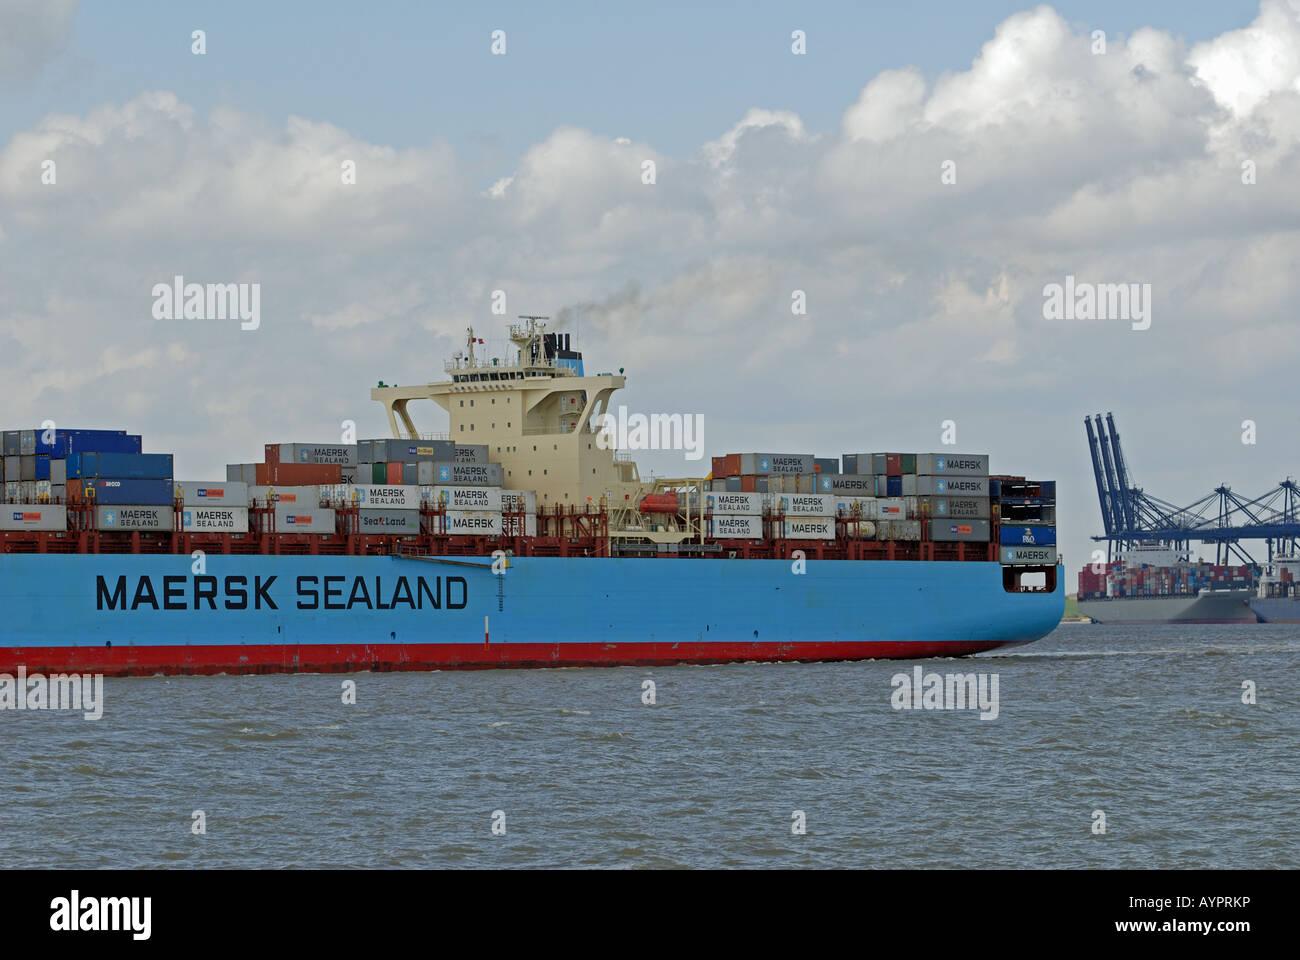 Mearsk 'Kobe' container ship, Port of Felixstowe, Suffolk, UK. - Stock Image